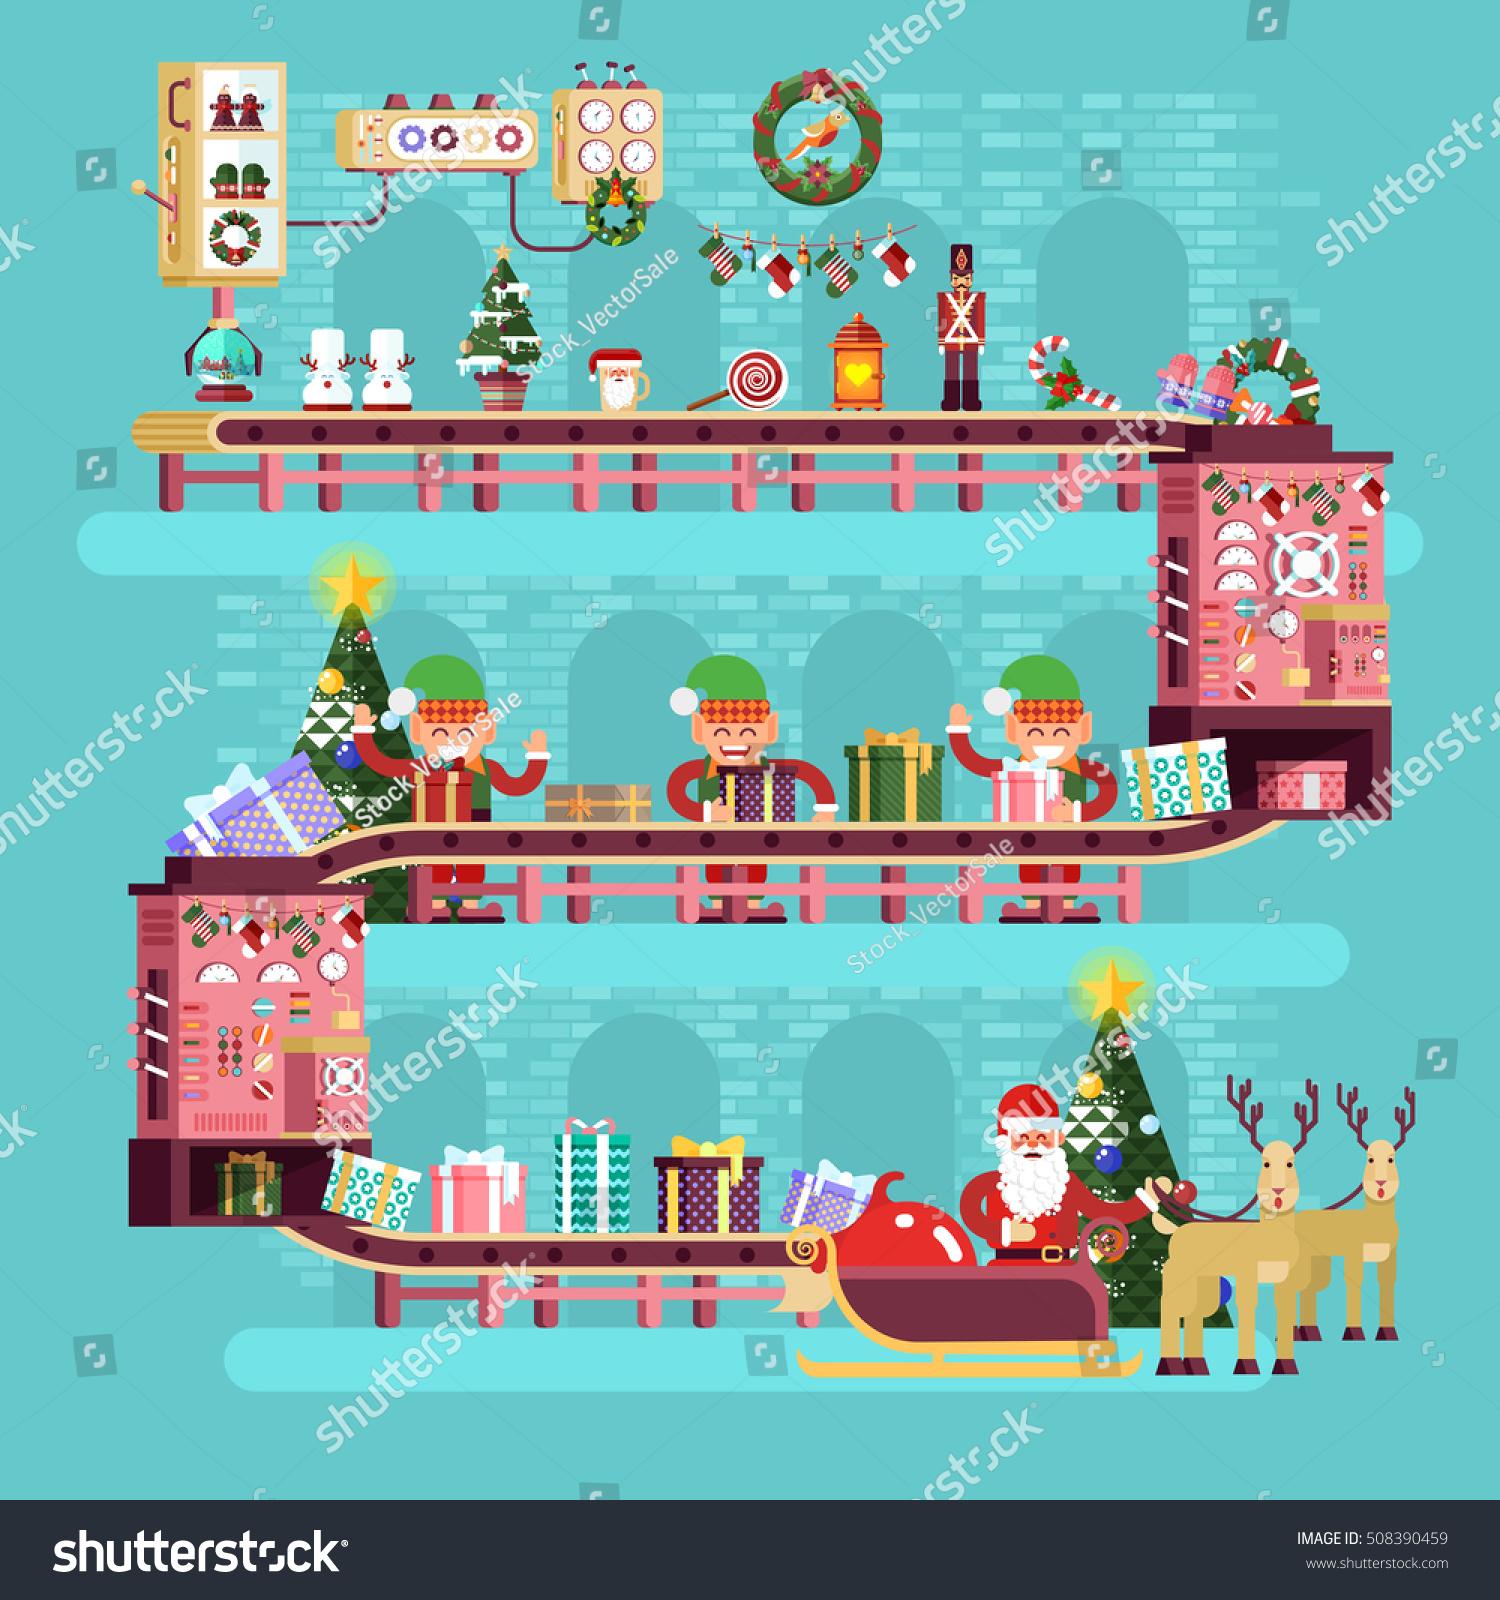 Stock vector illustration isolated christmas conveyor